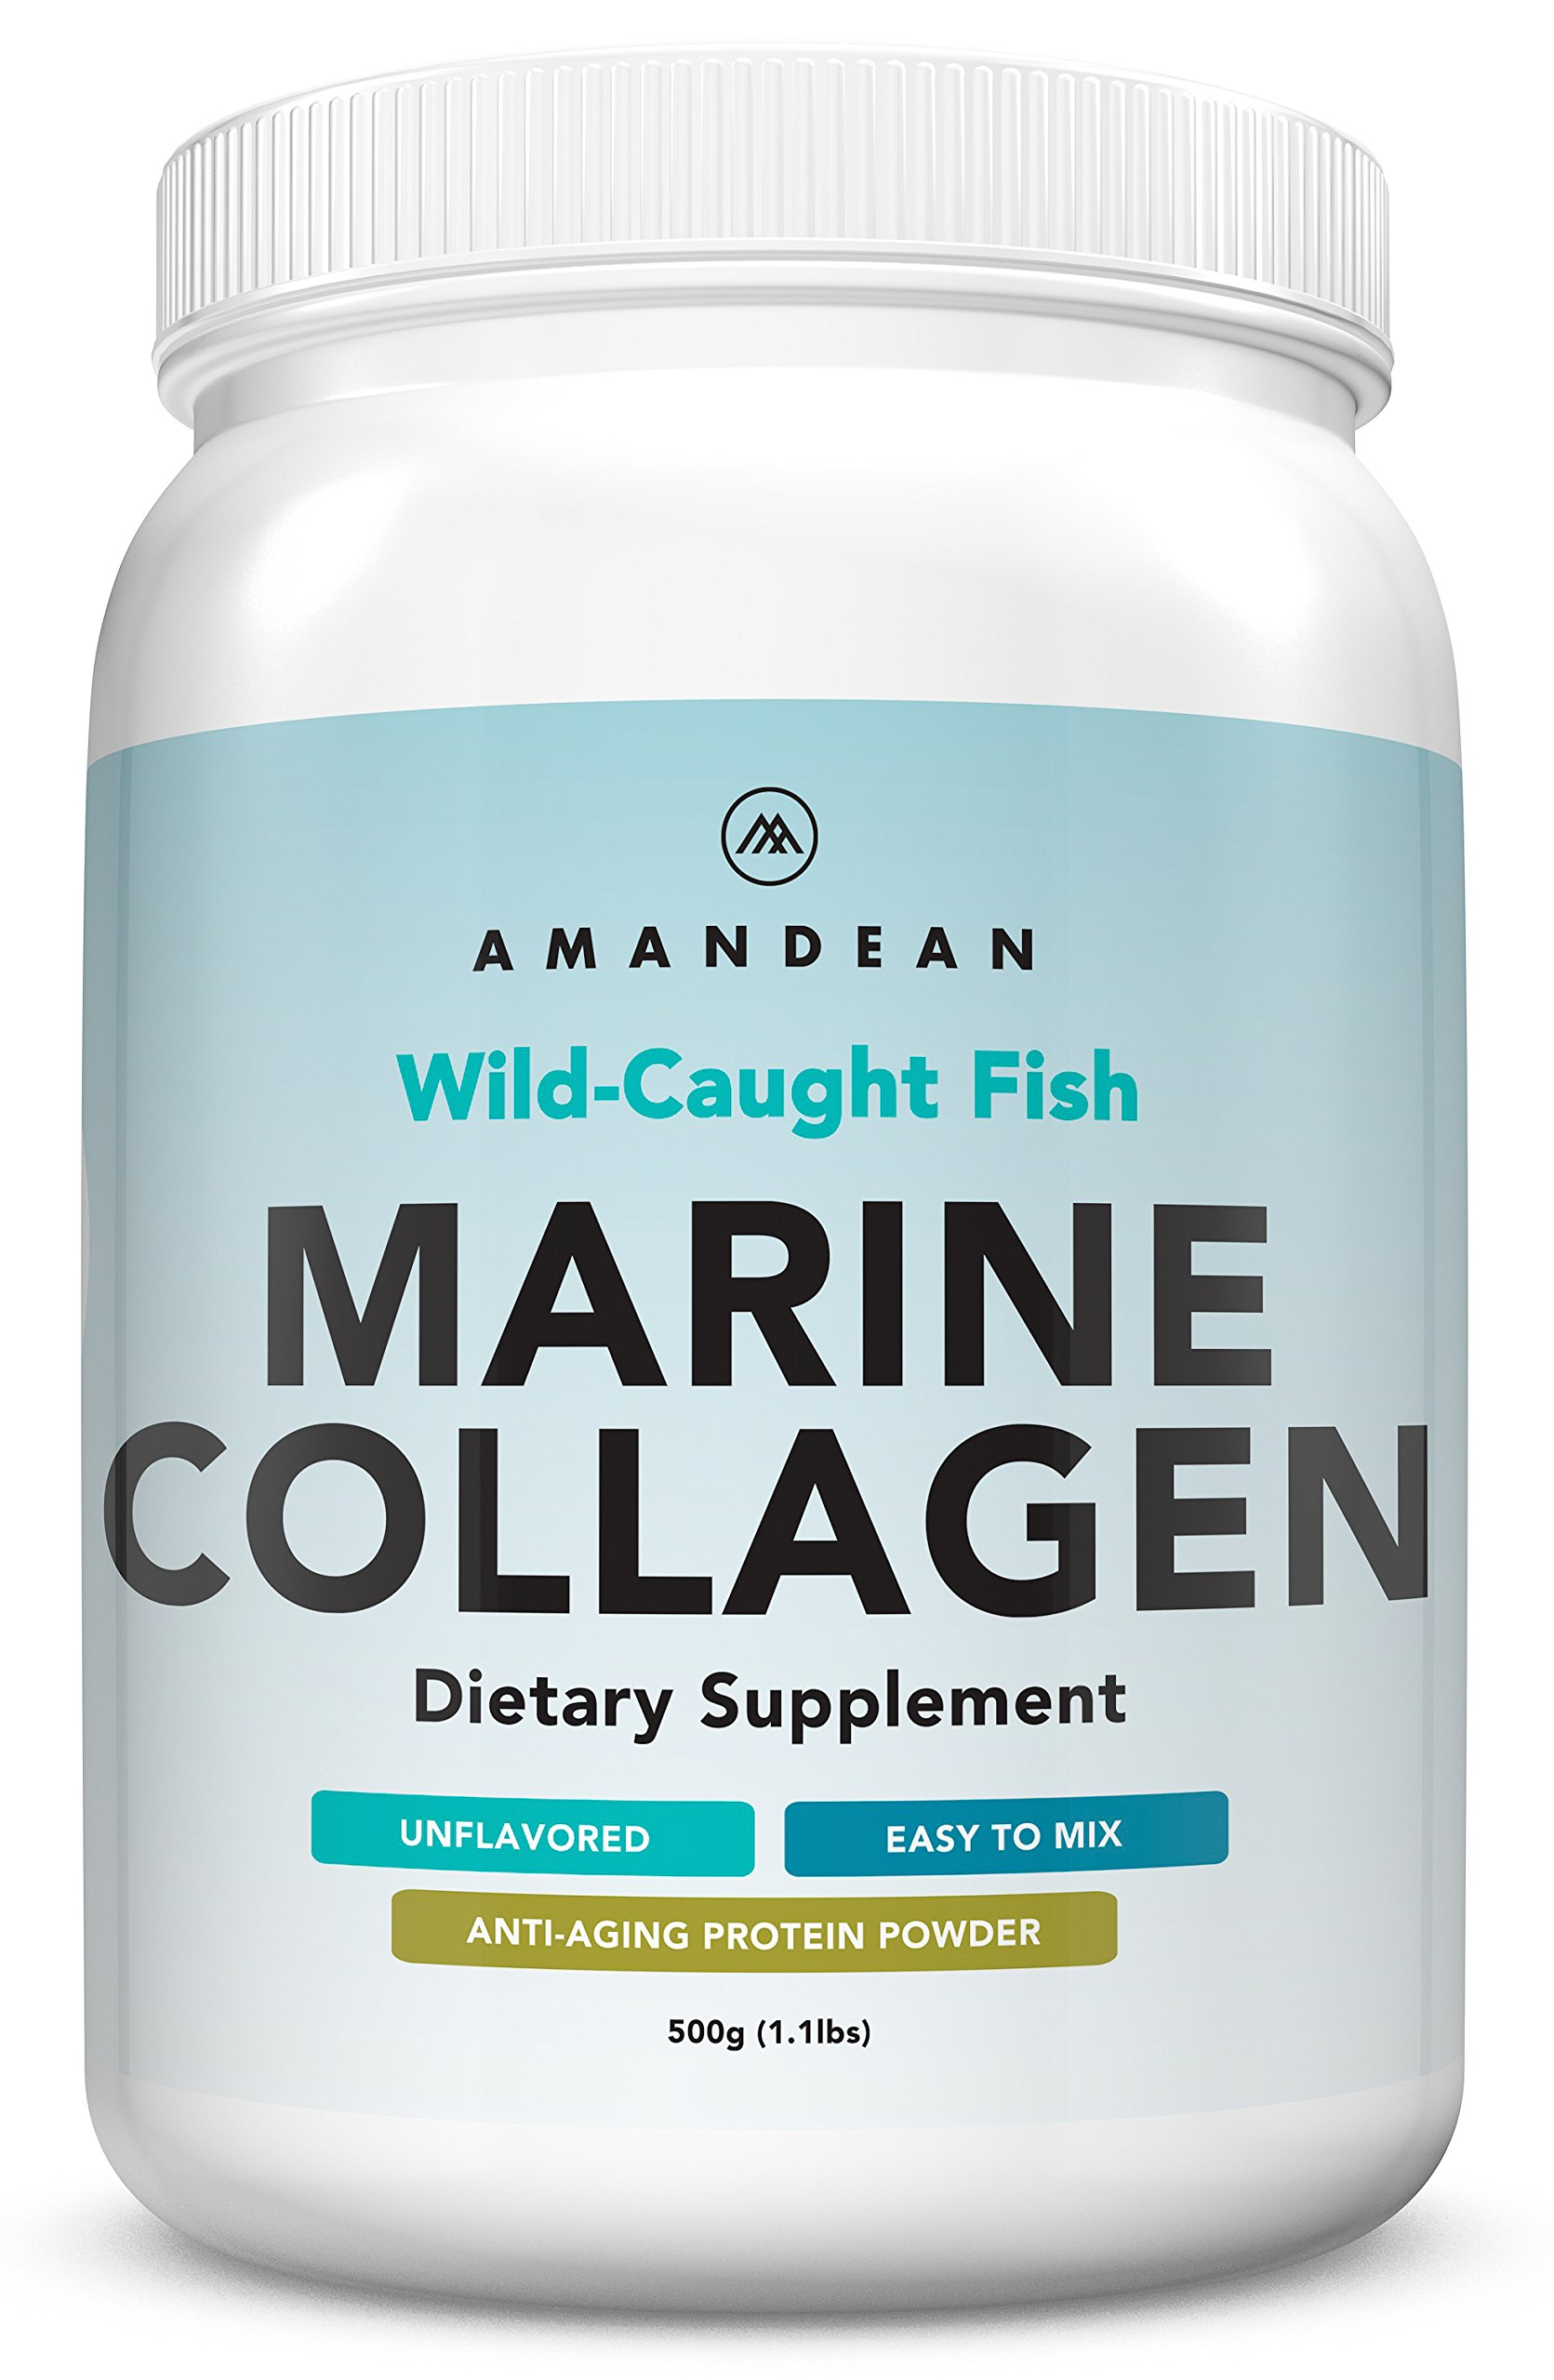 Premium Anti-Aging Marine Collagen Powder 17.6 Oz | Wild-Caught Hydrolyzed Fish Collagen Peptides | Type 1 & 3 Collagen Protein Supplement | Amino Acids for Skin, Hair, Nails | Paleo Friendly, Non-GMO by AMANDEAN